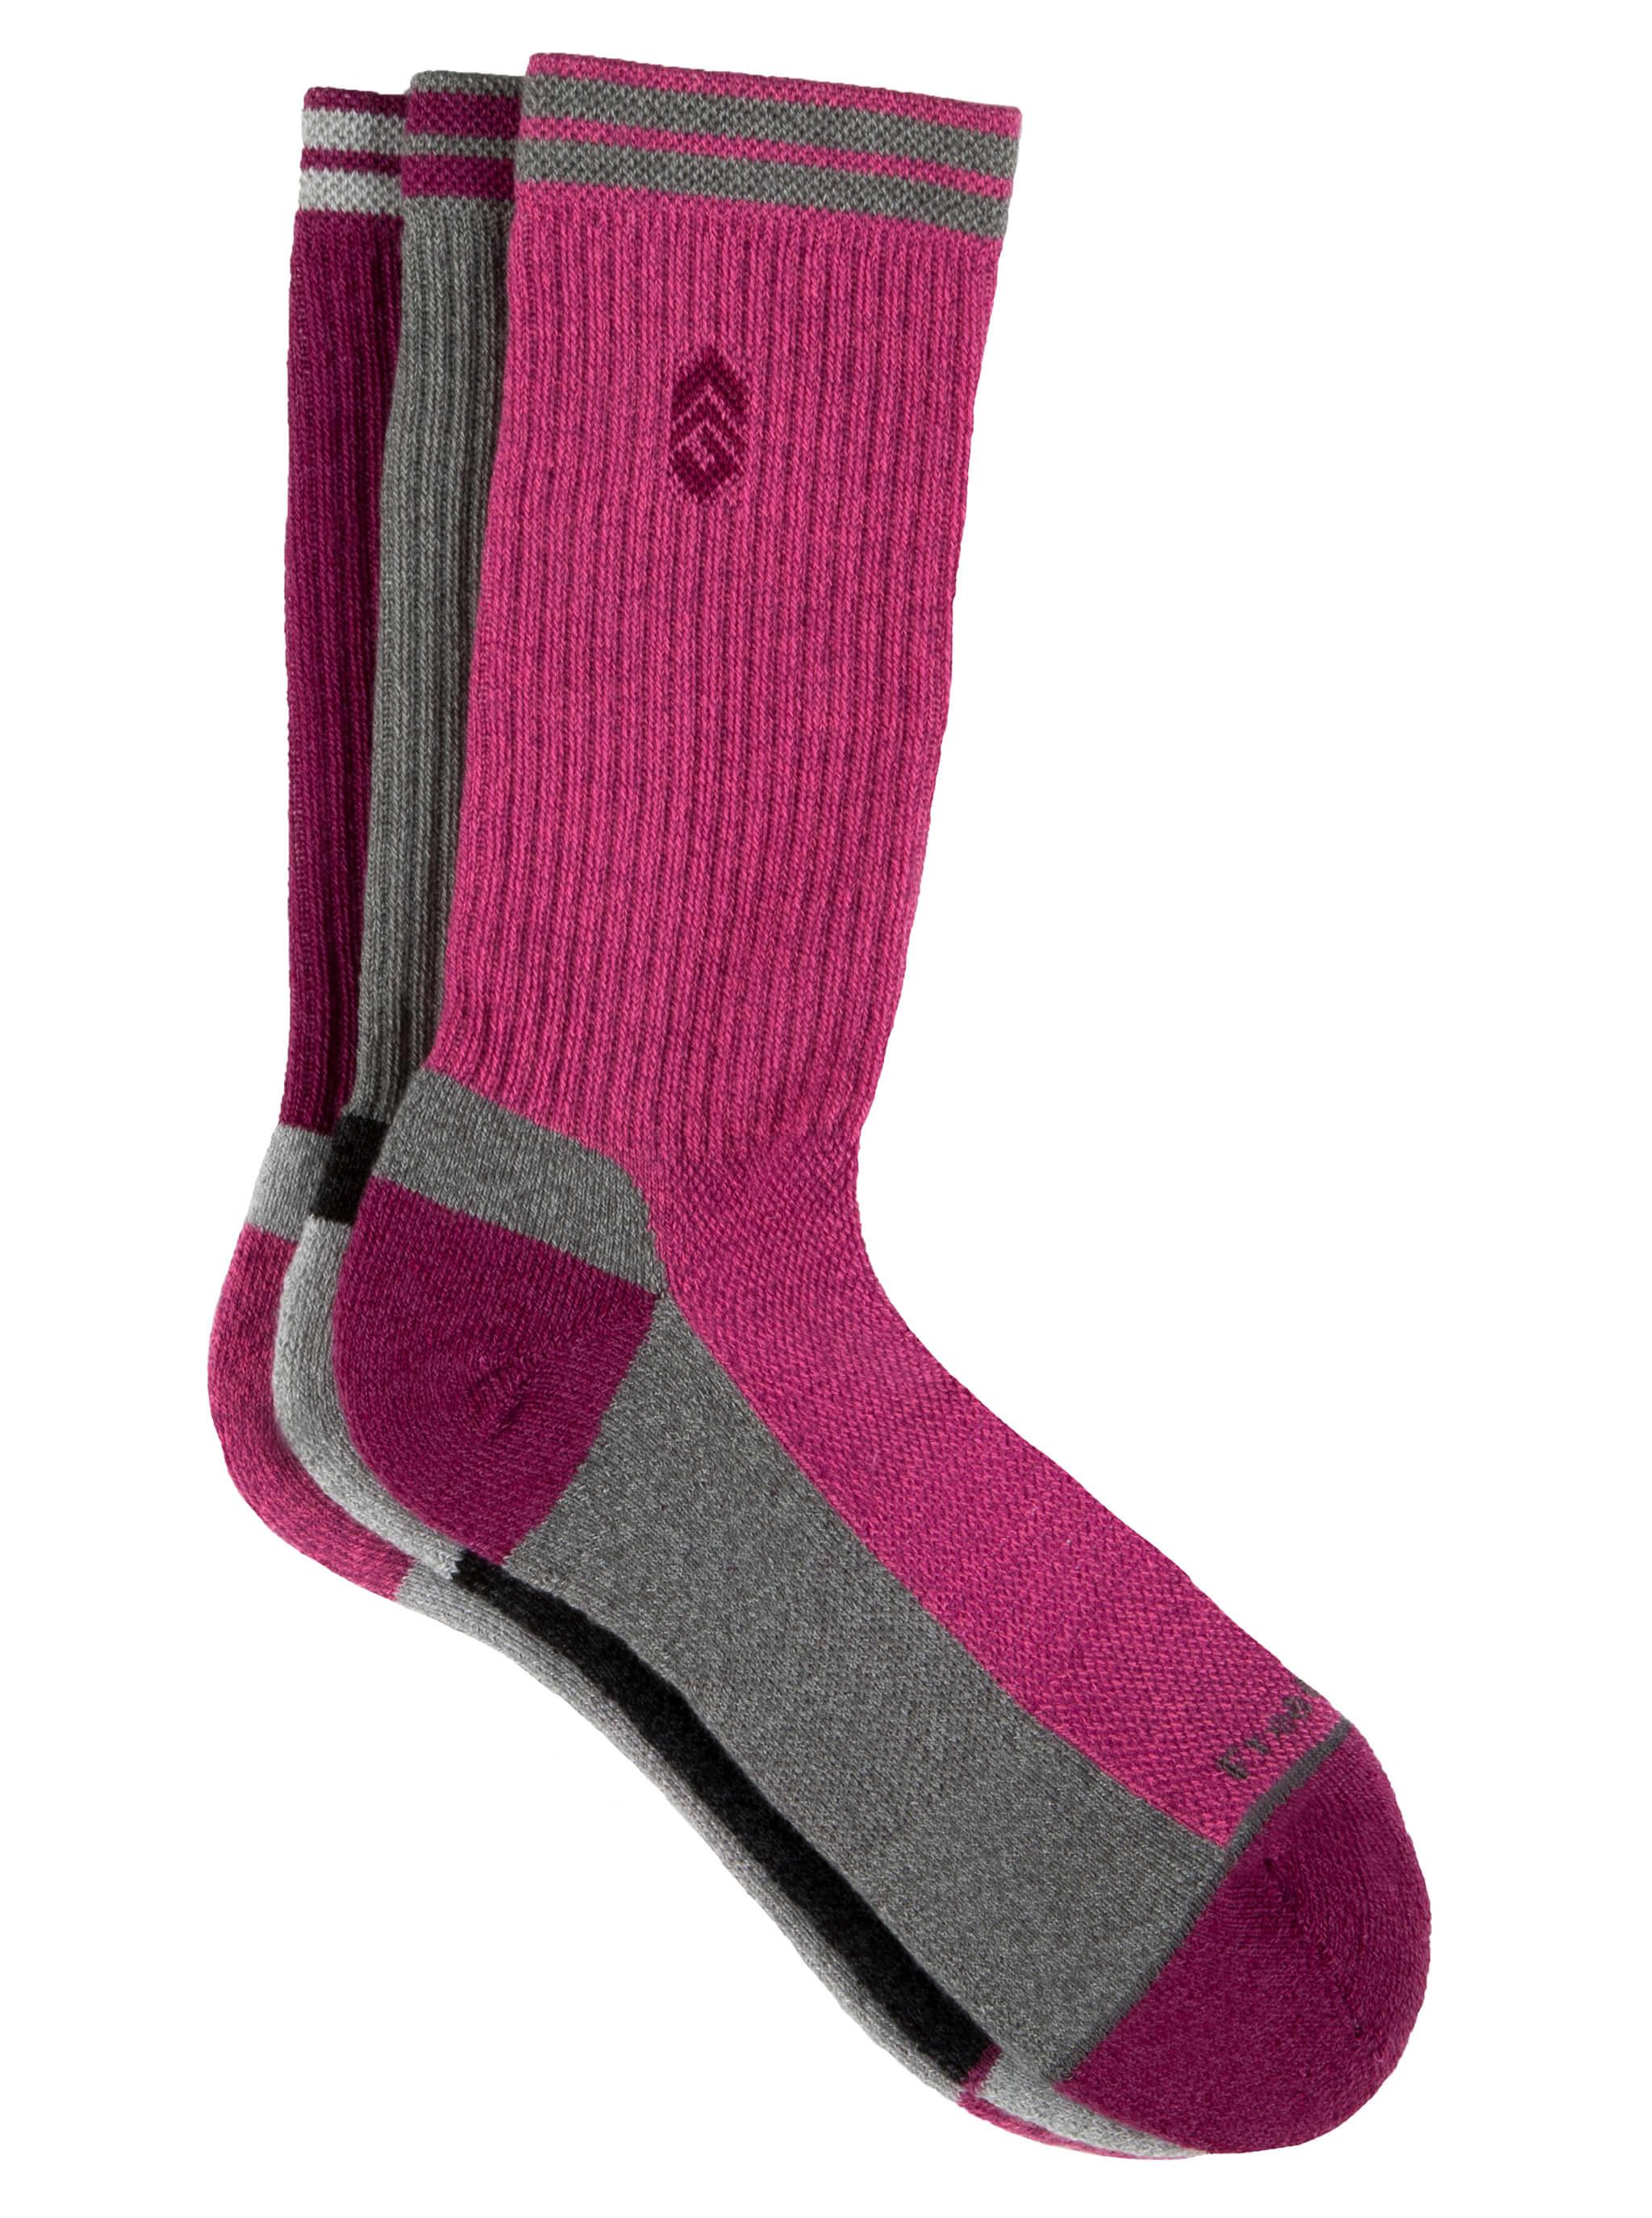 Free Country Women's Basic Varsity Stripe Crew Socks - Pink